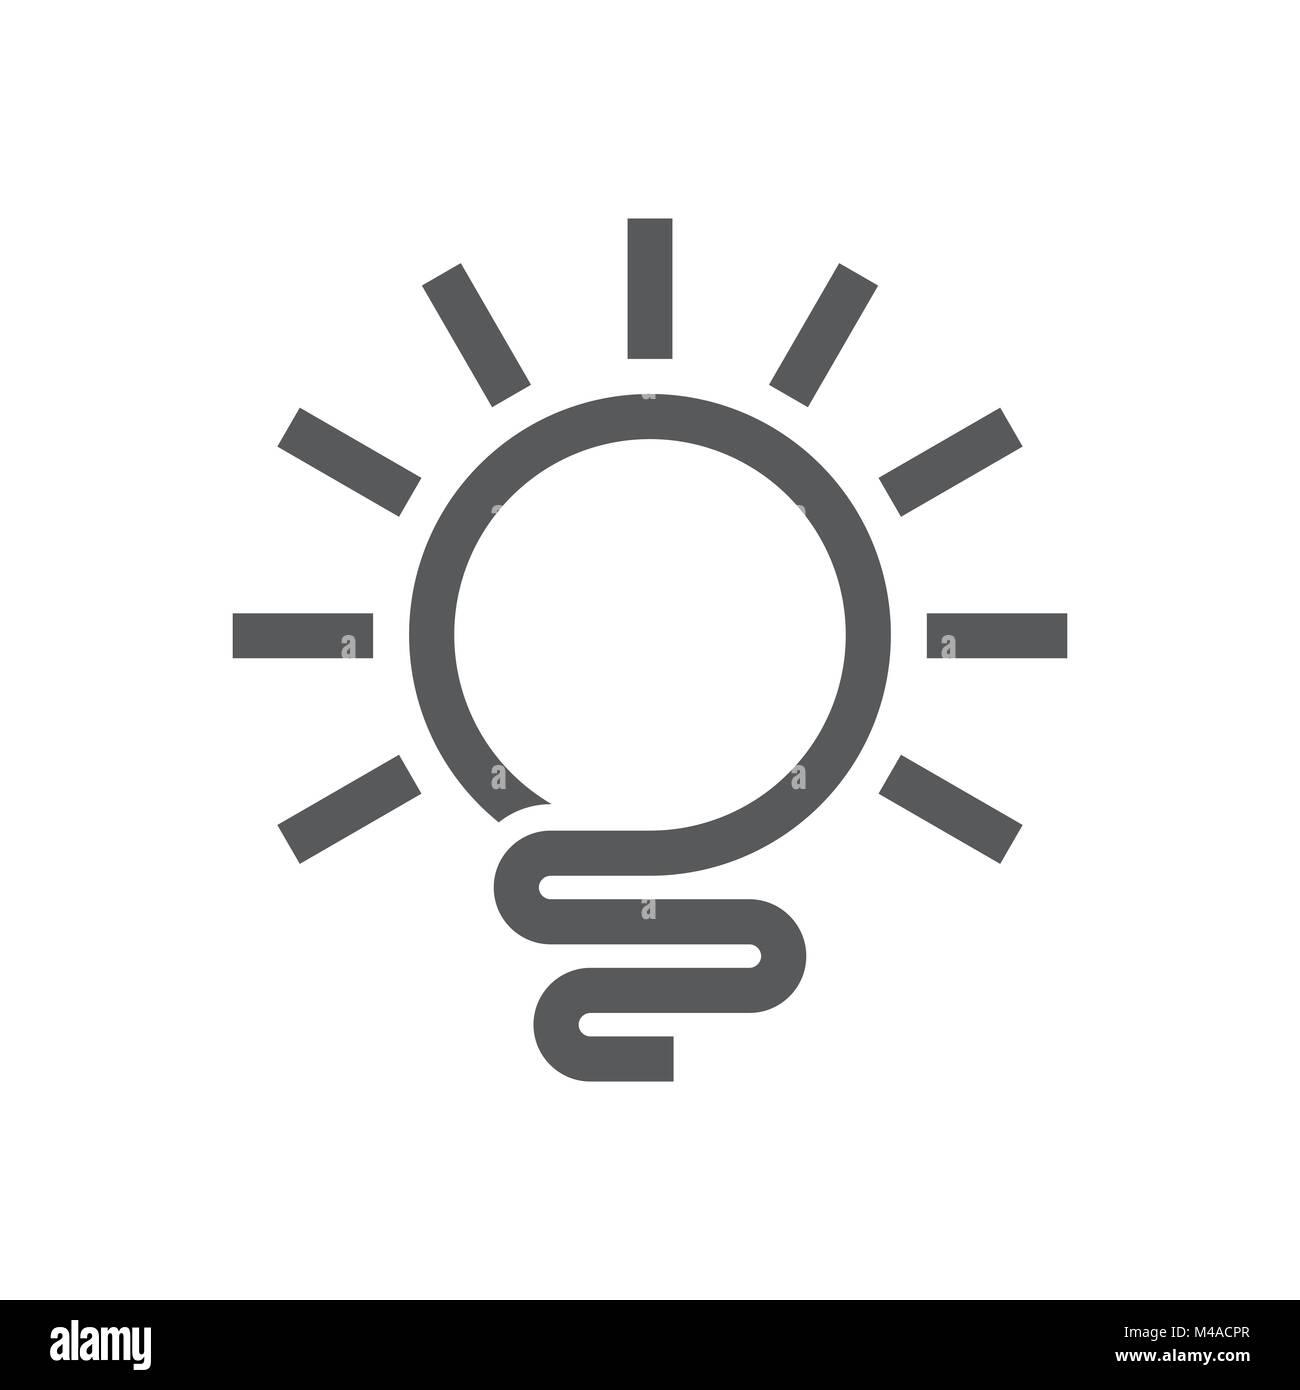 Abstract Light Bulb Line Art Logo Symbol Vector Graphic